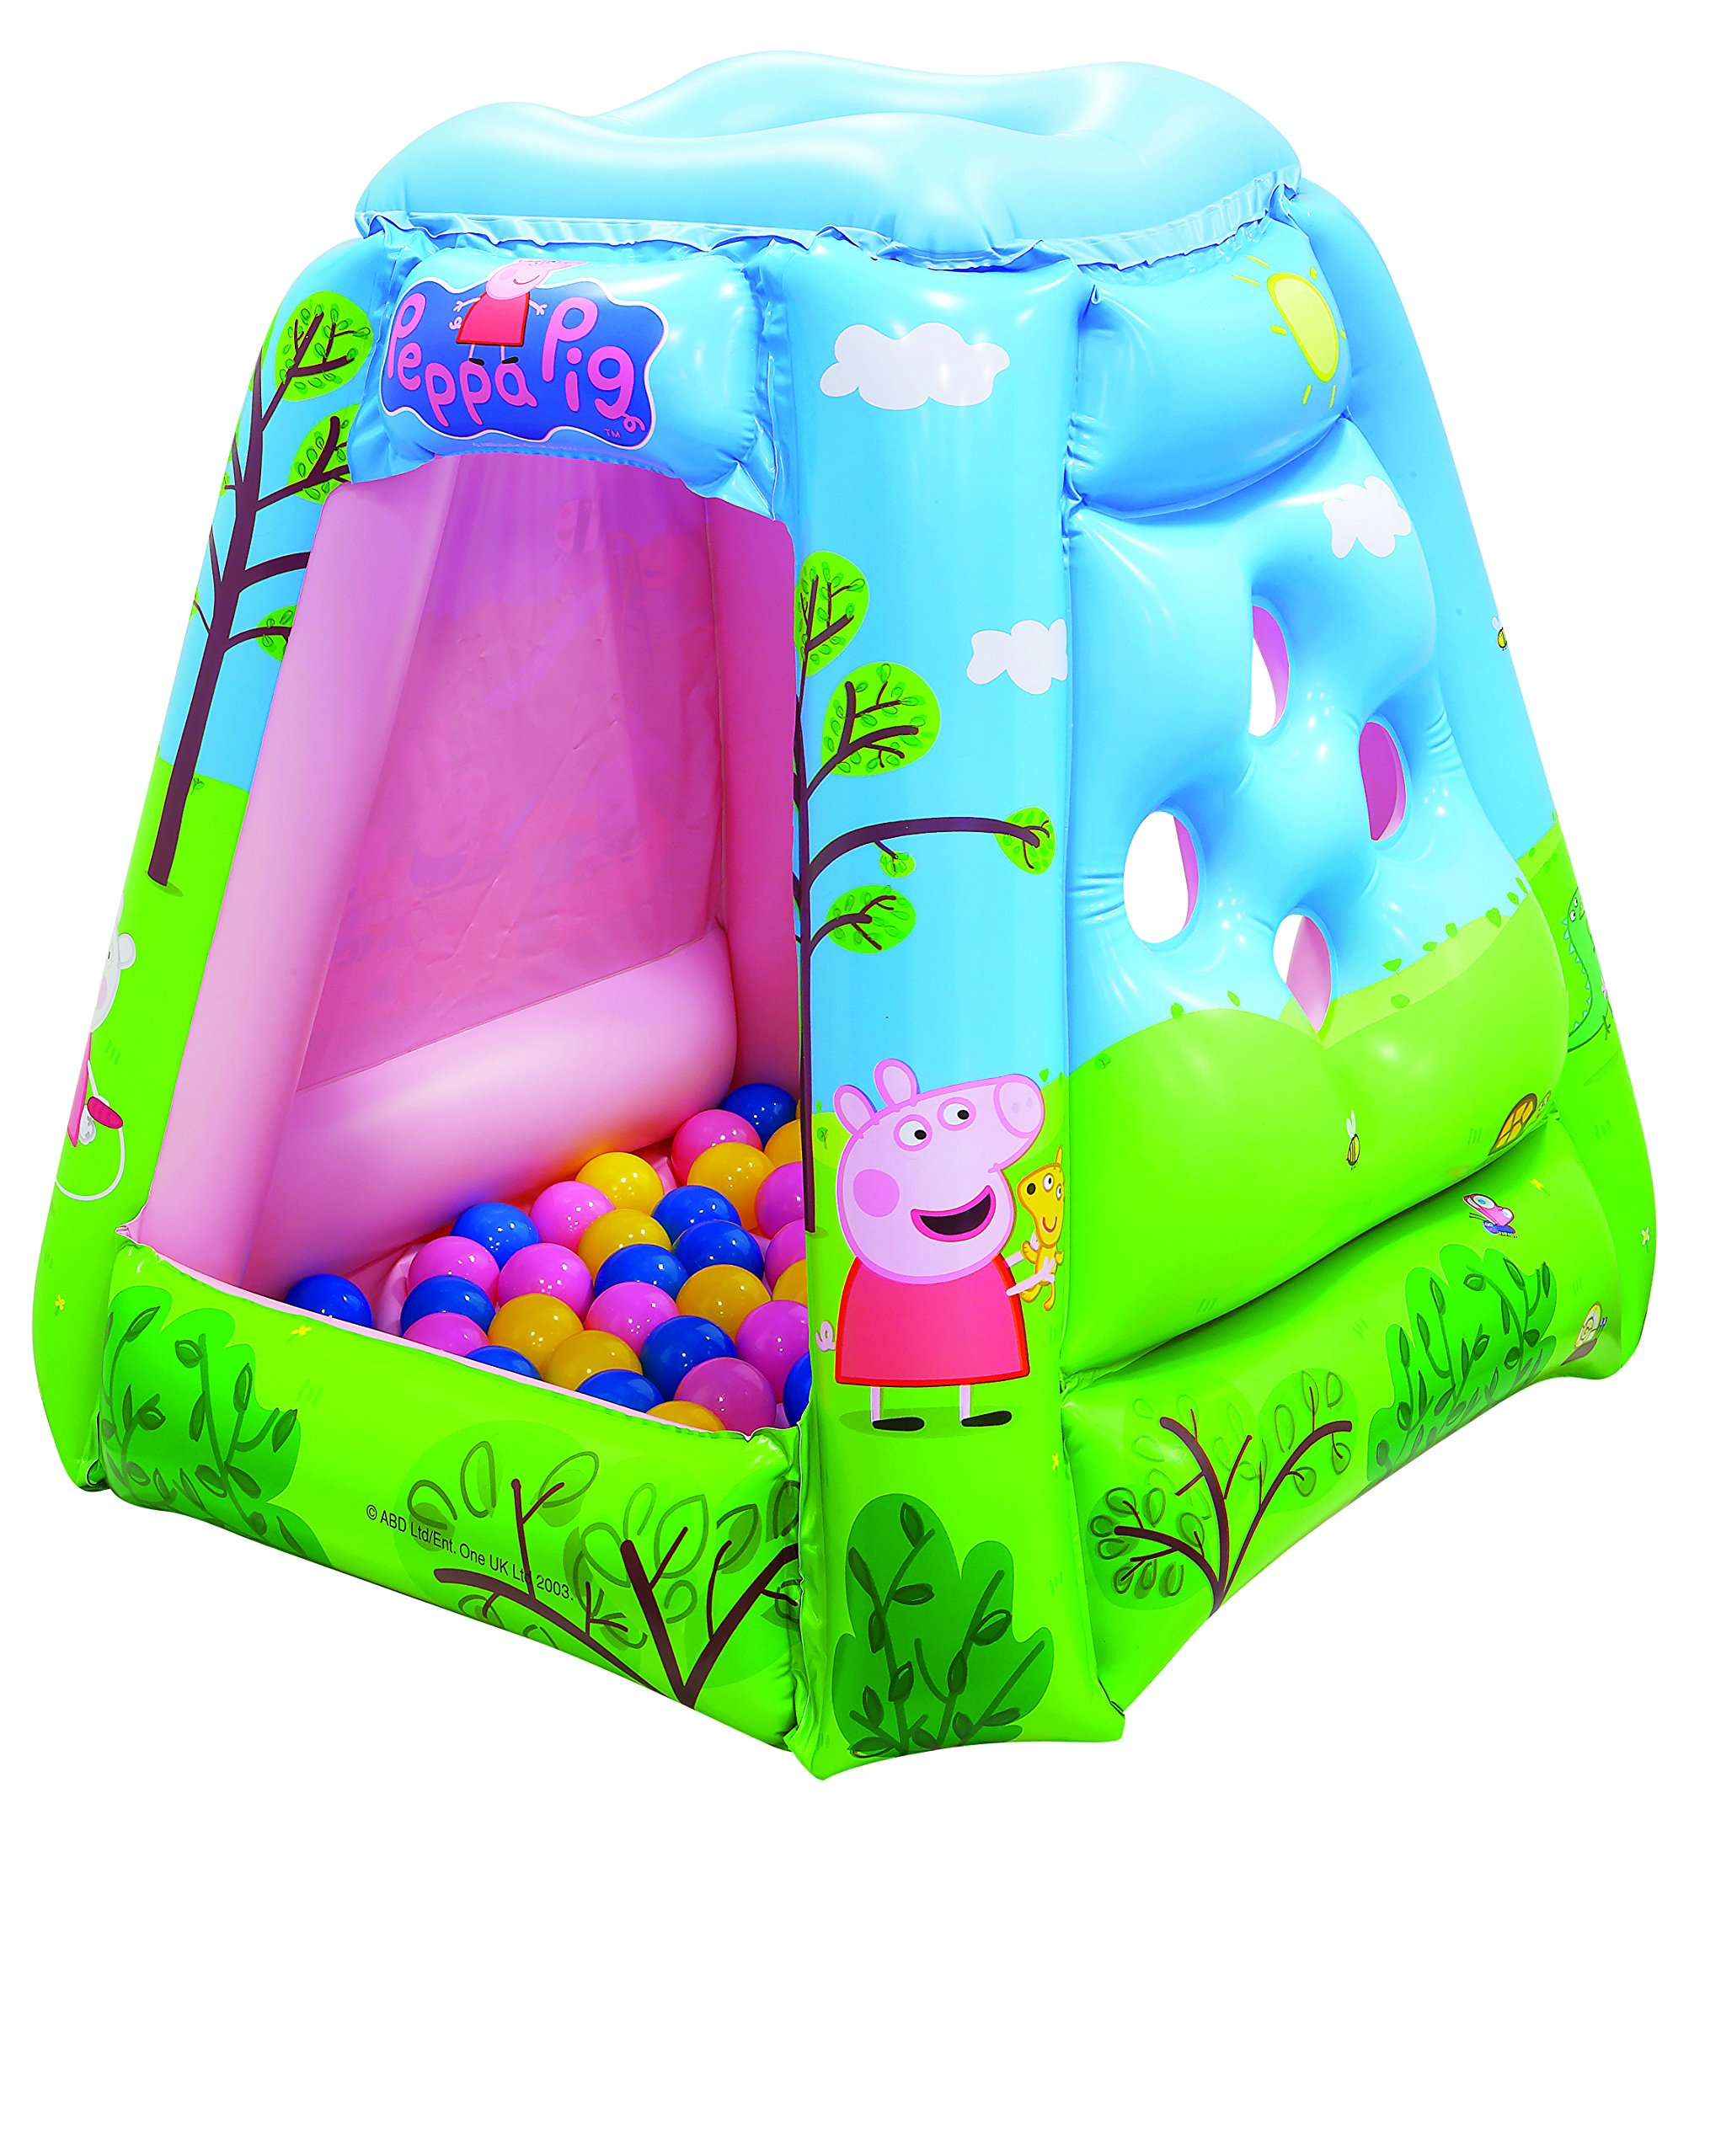 Peppa Pig Ball Pit, 1 Inflatable & 20 Sof-Flex Balls, Blue/Green, 37''W x 37''D x 34''H by Peppa Pig (Image #2)